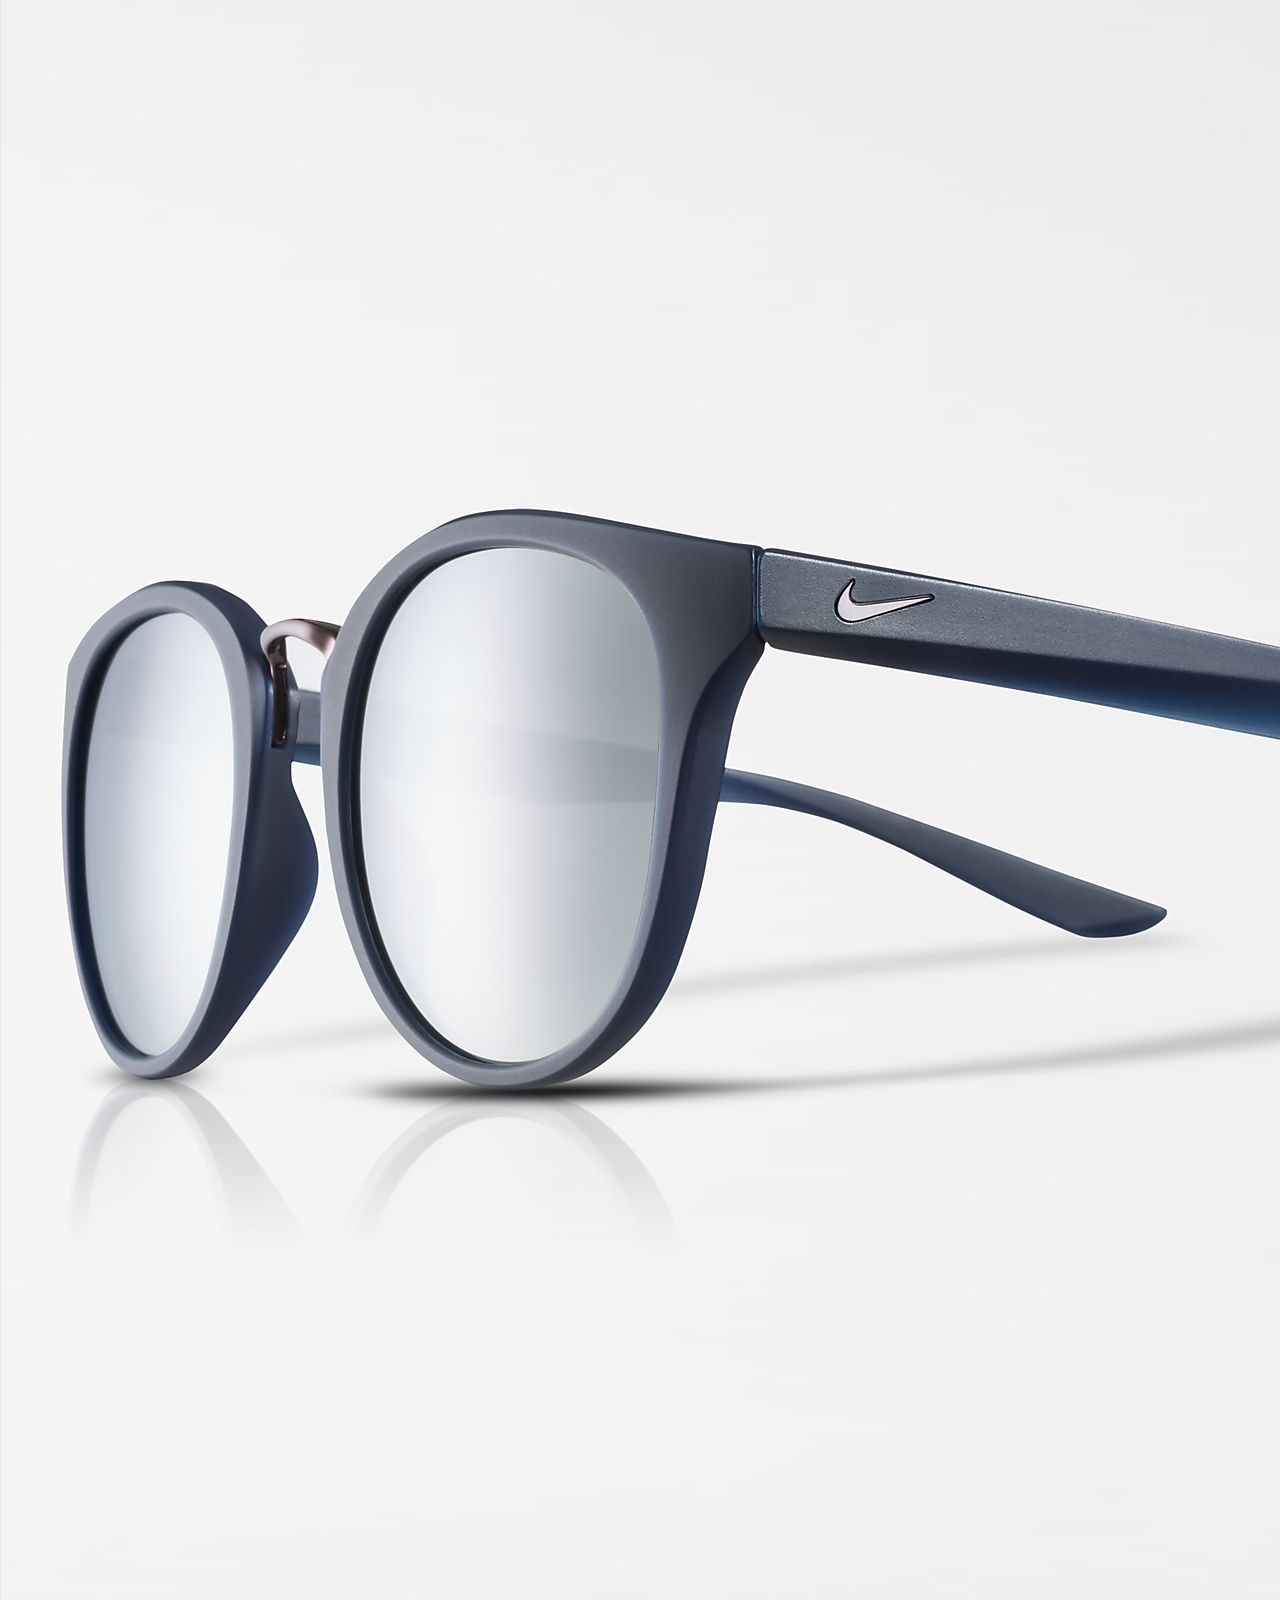 Solglasögon Nike Revere Mirrored